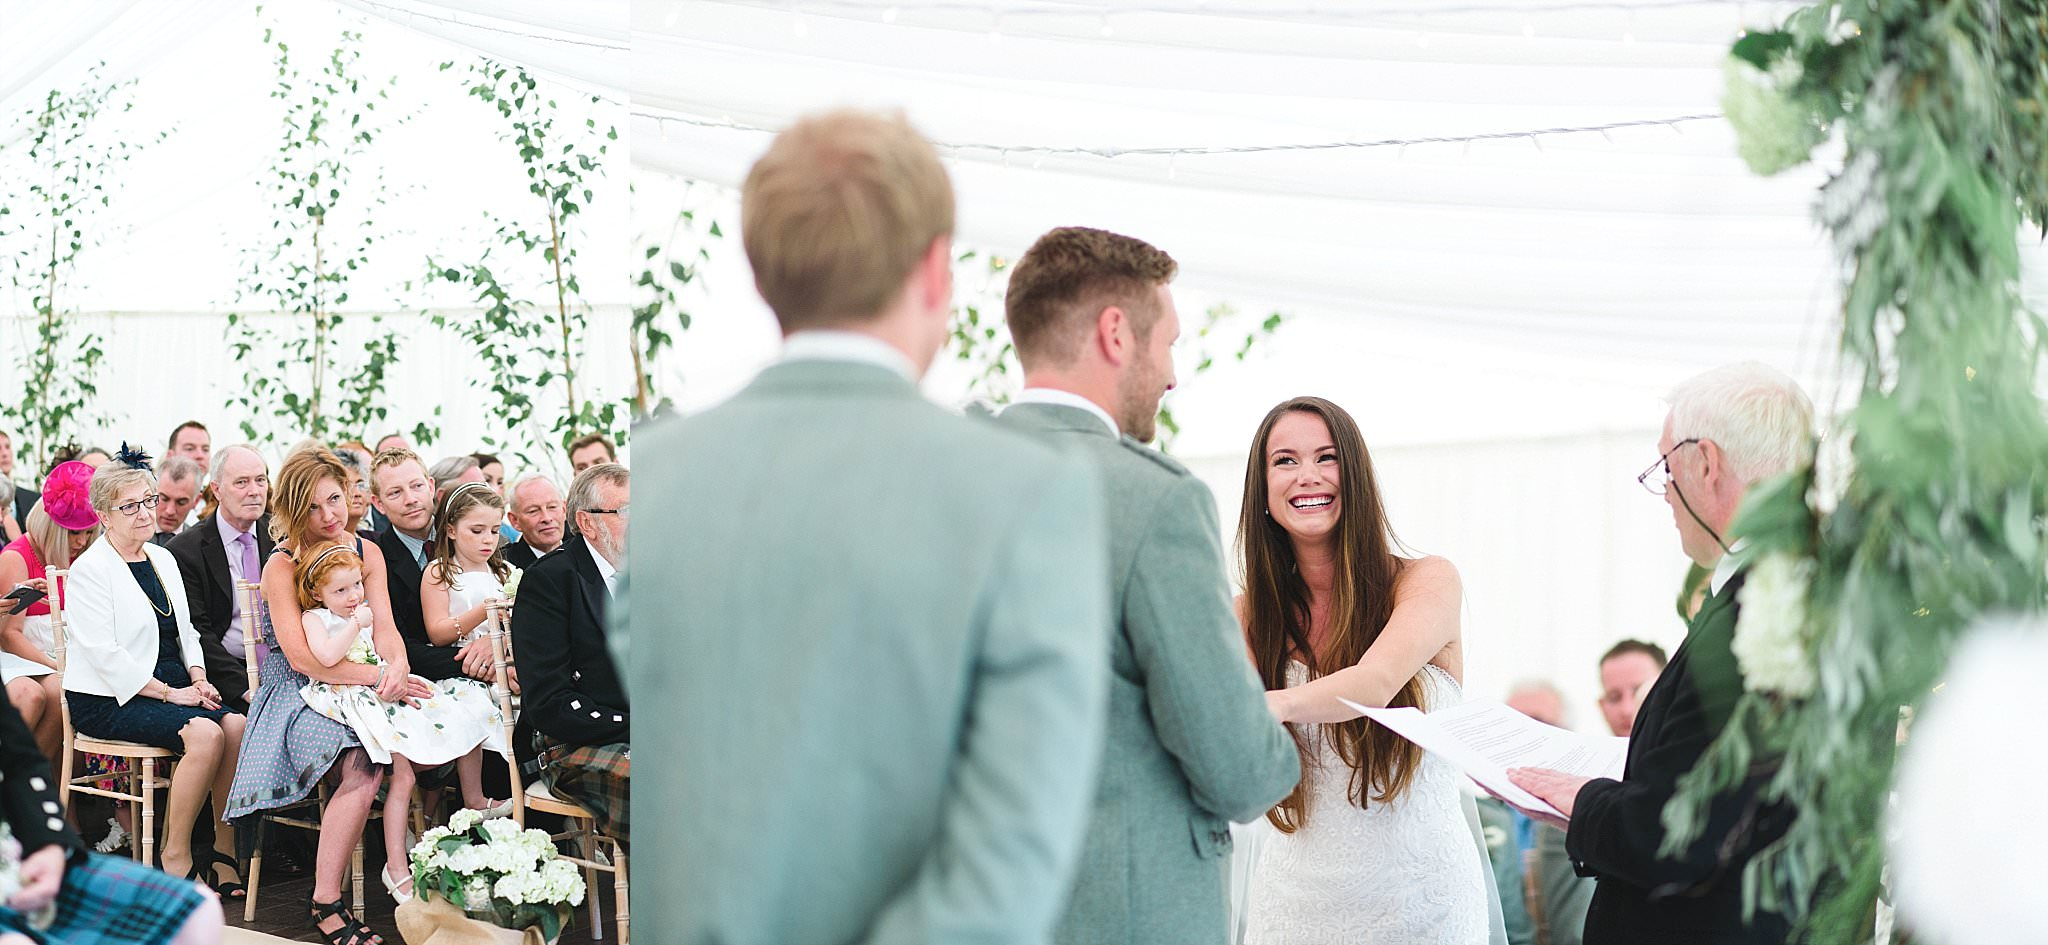 Fine Art Wedding Photographers,The Gibsons,ayrshire wedding photographer,elegant wedding photographers glasgow,glasgow wedding photographe: glasgow wedding photographers,natural wedding photographers,romantic photographers Scotland,